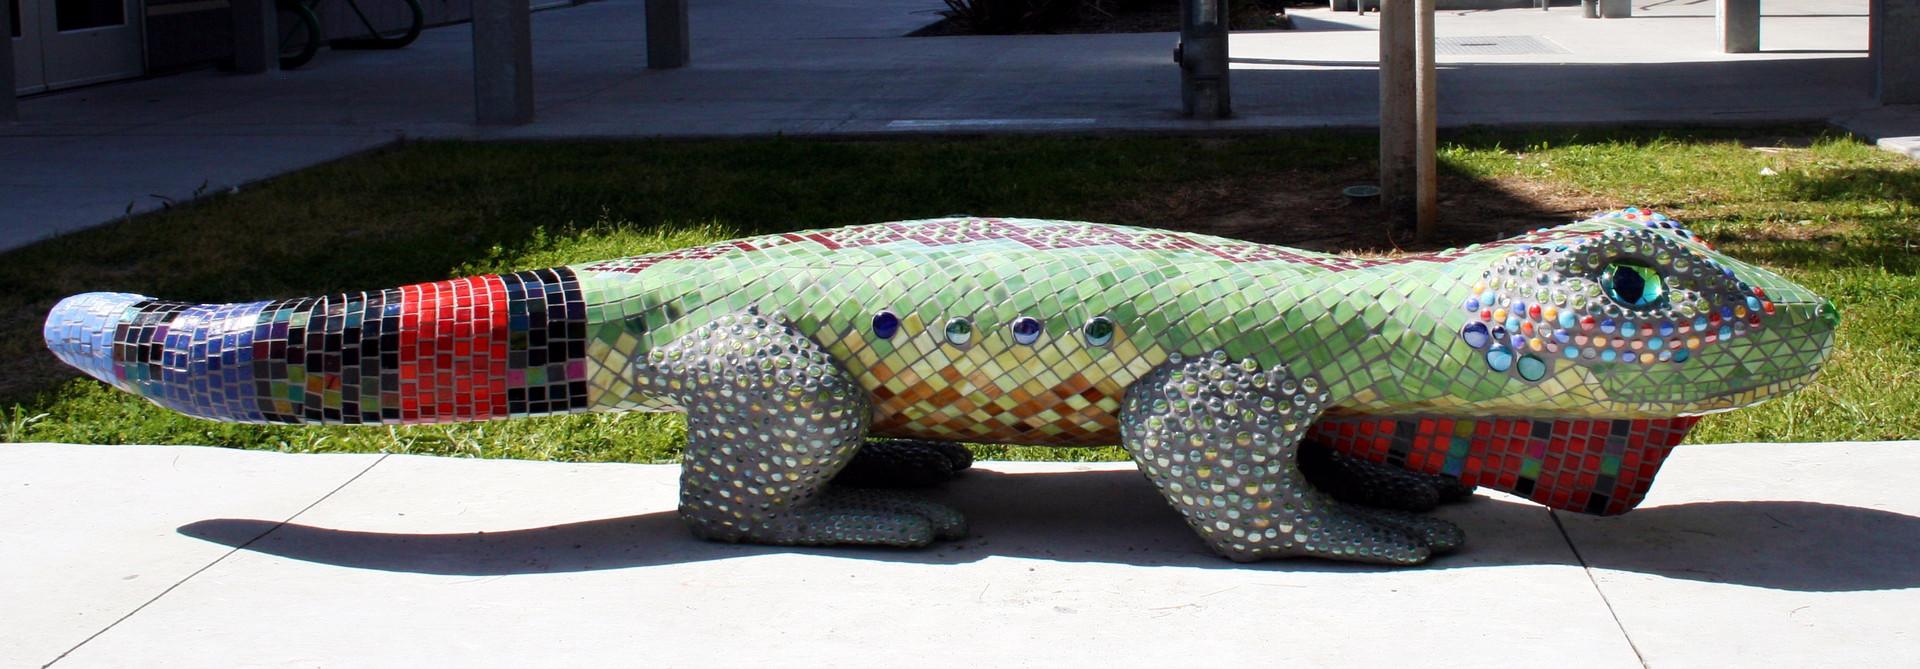 Iggy the Iguana Bench